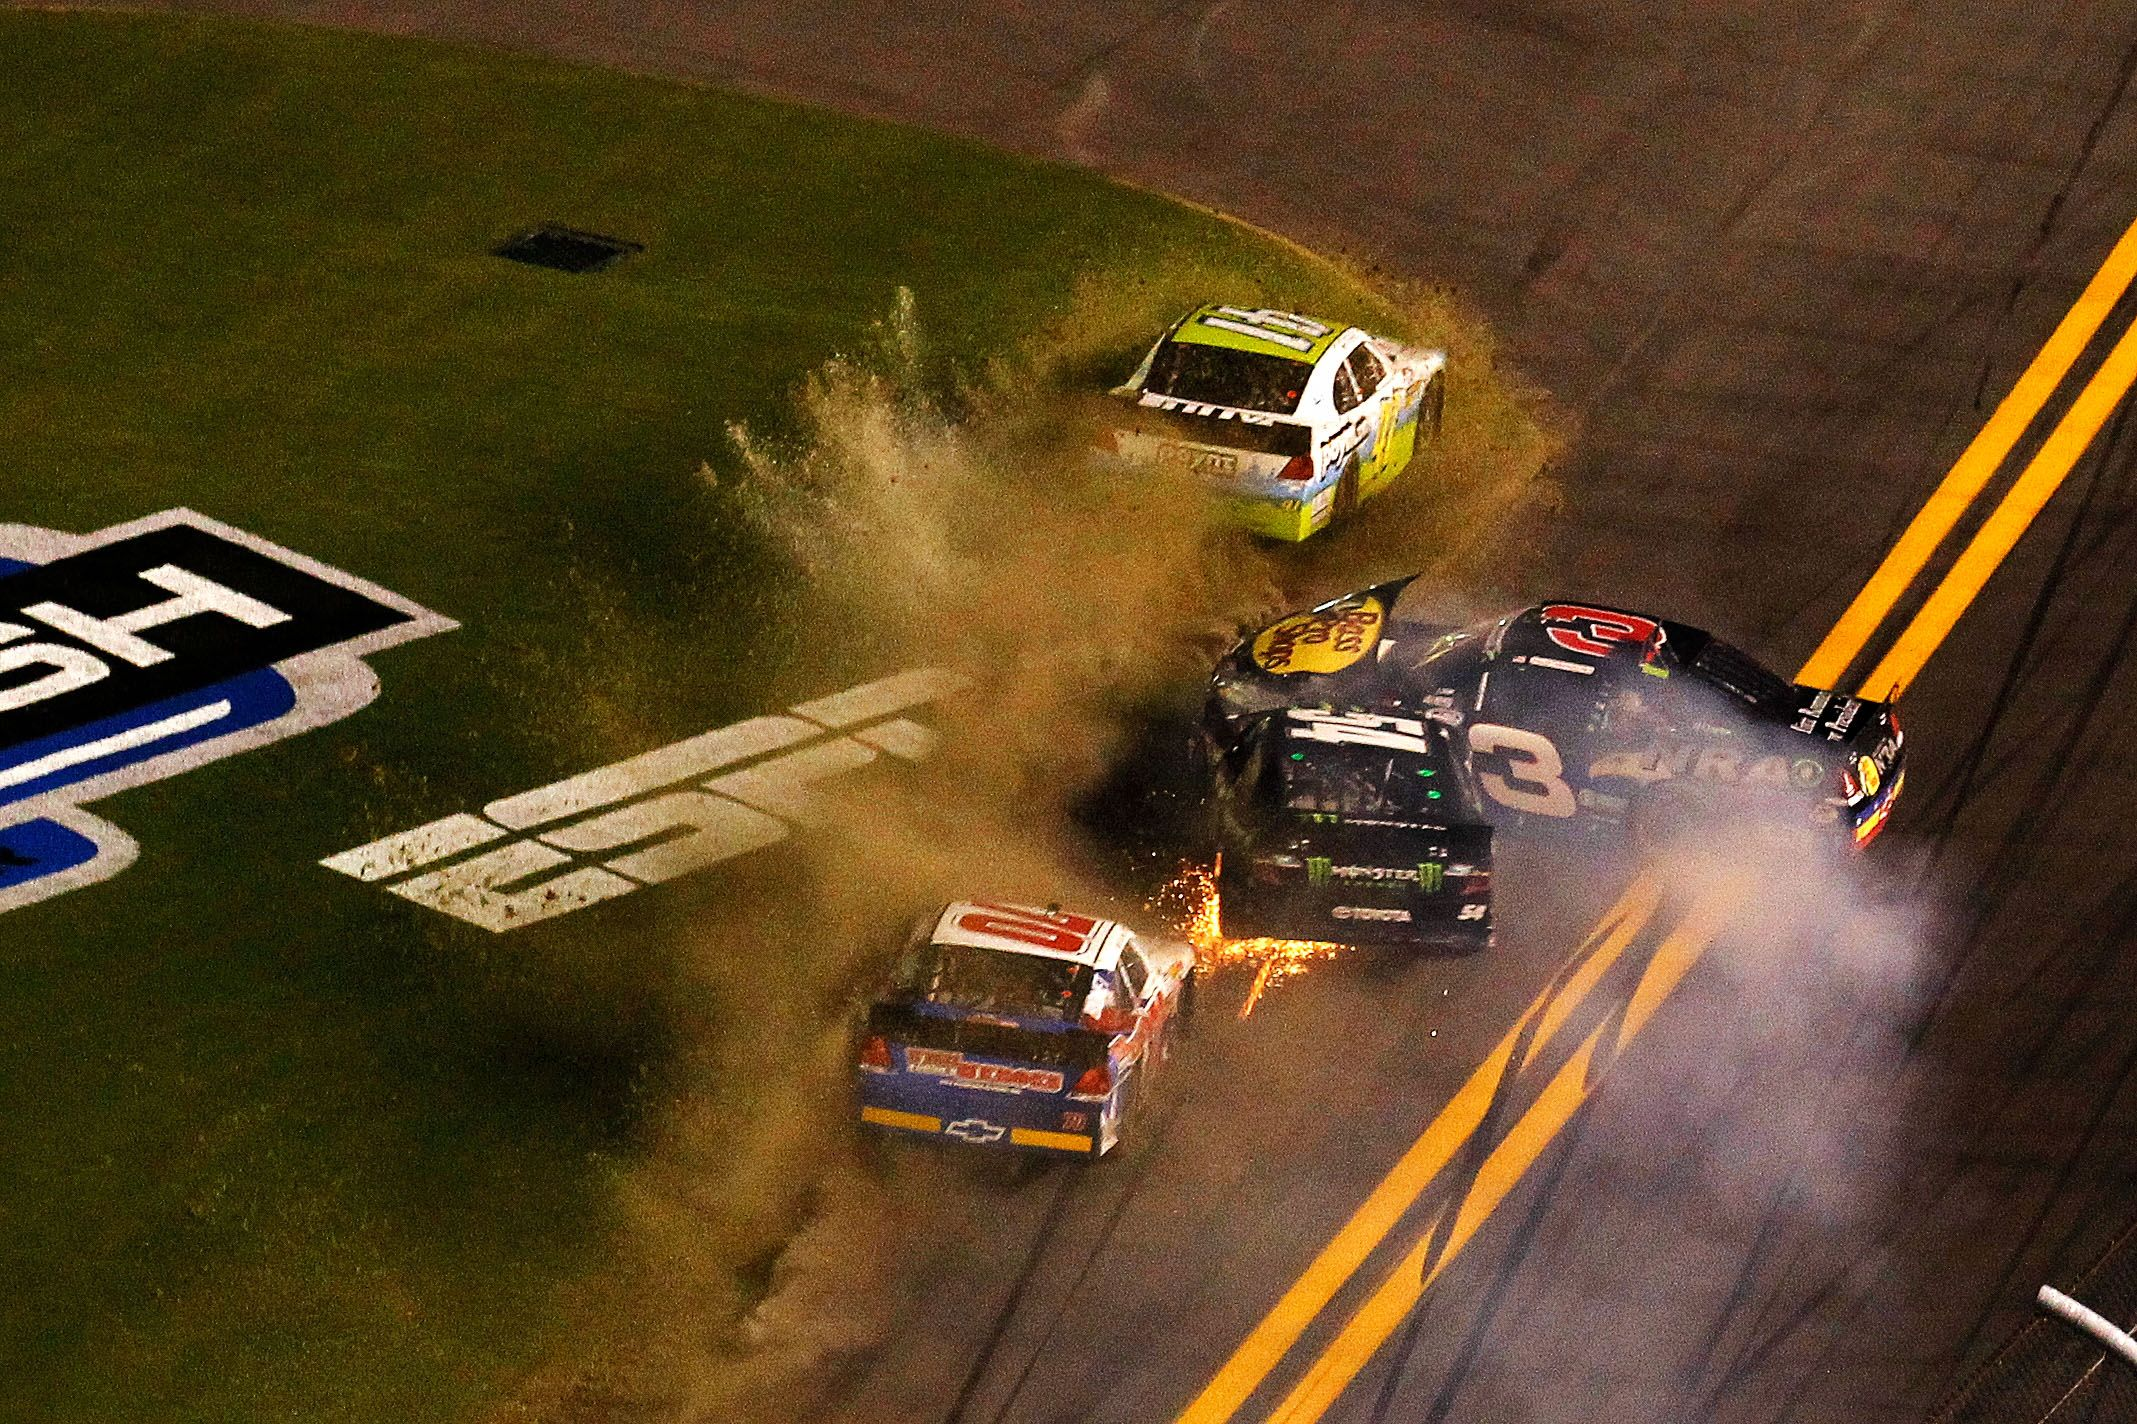 Crash, Bang, Wallop Videos: Racing Crashes of the Decade